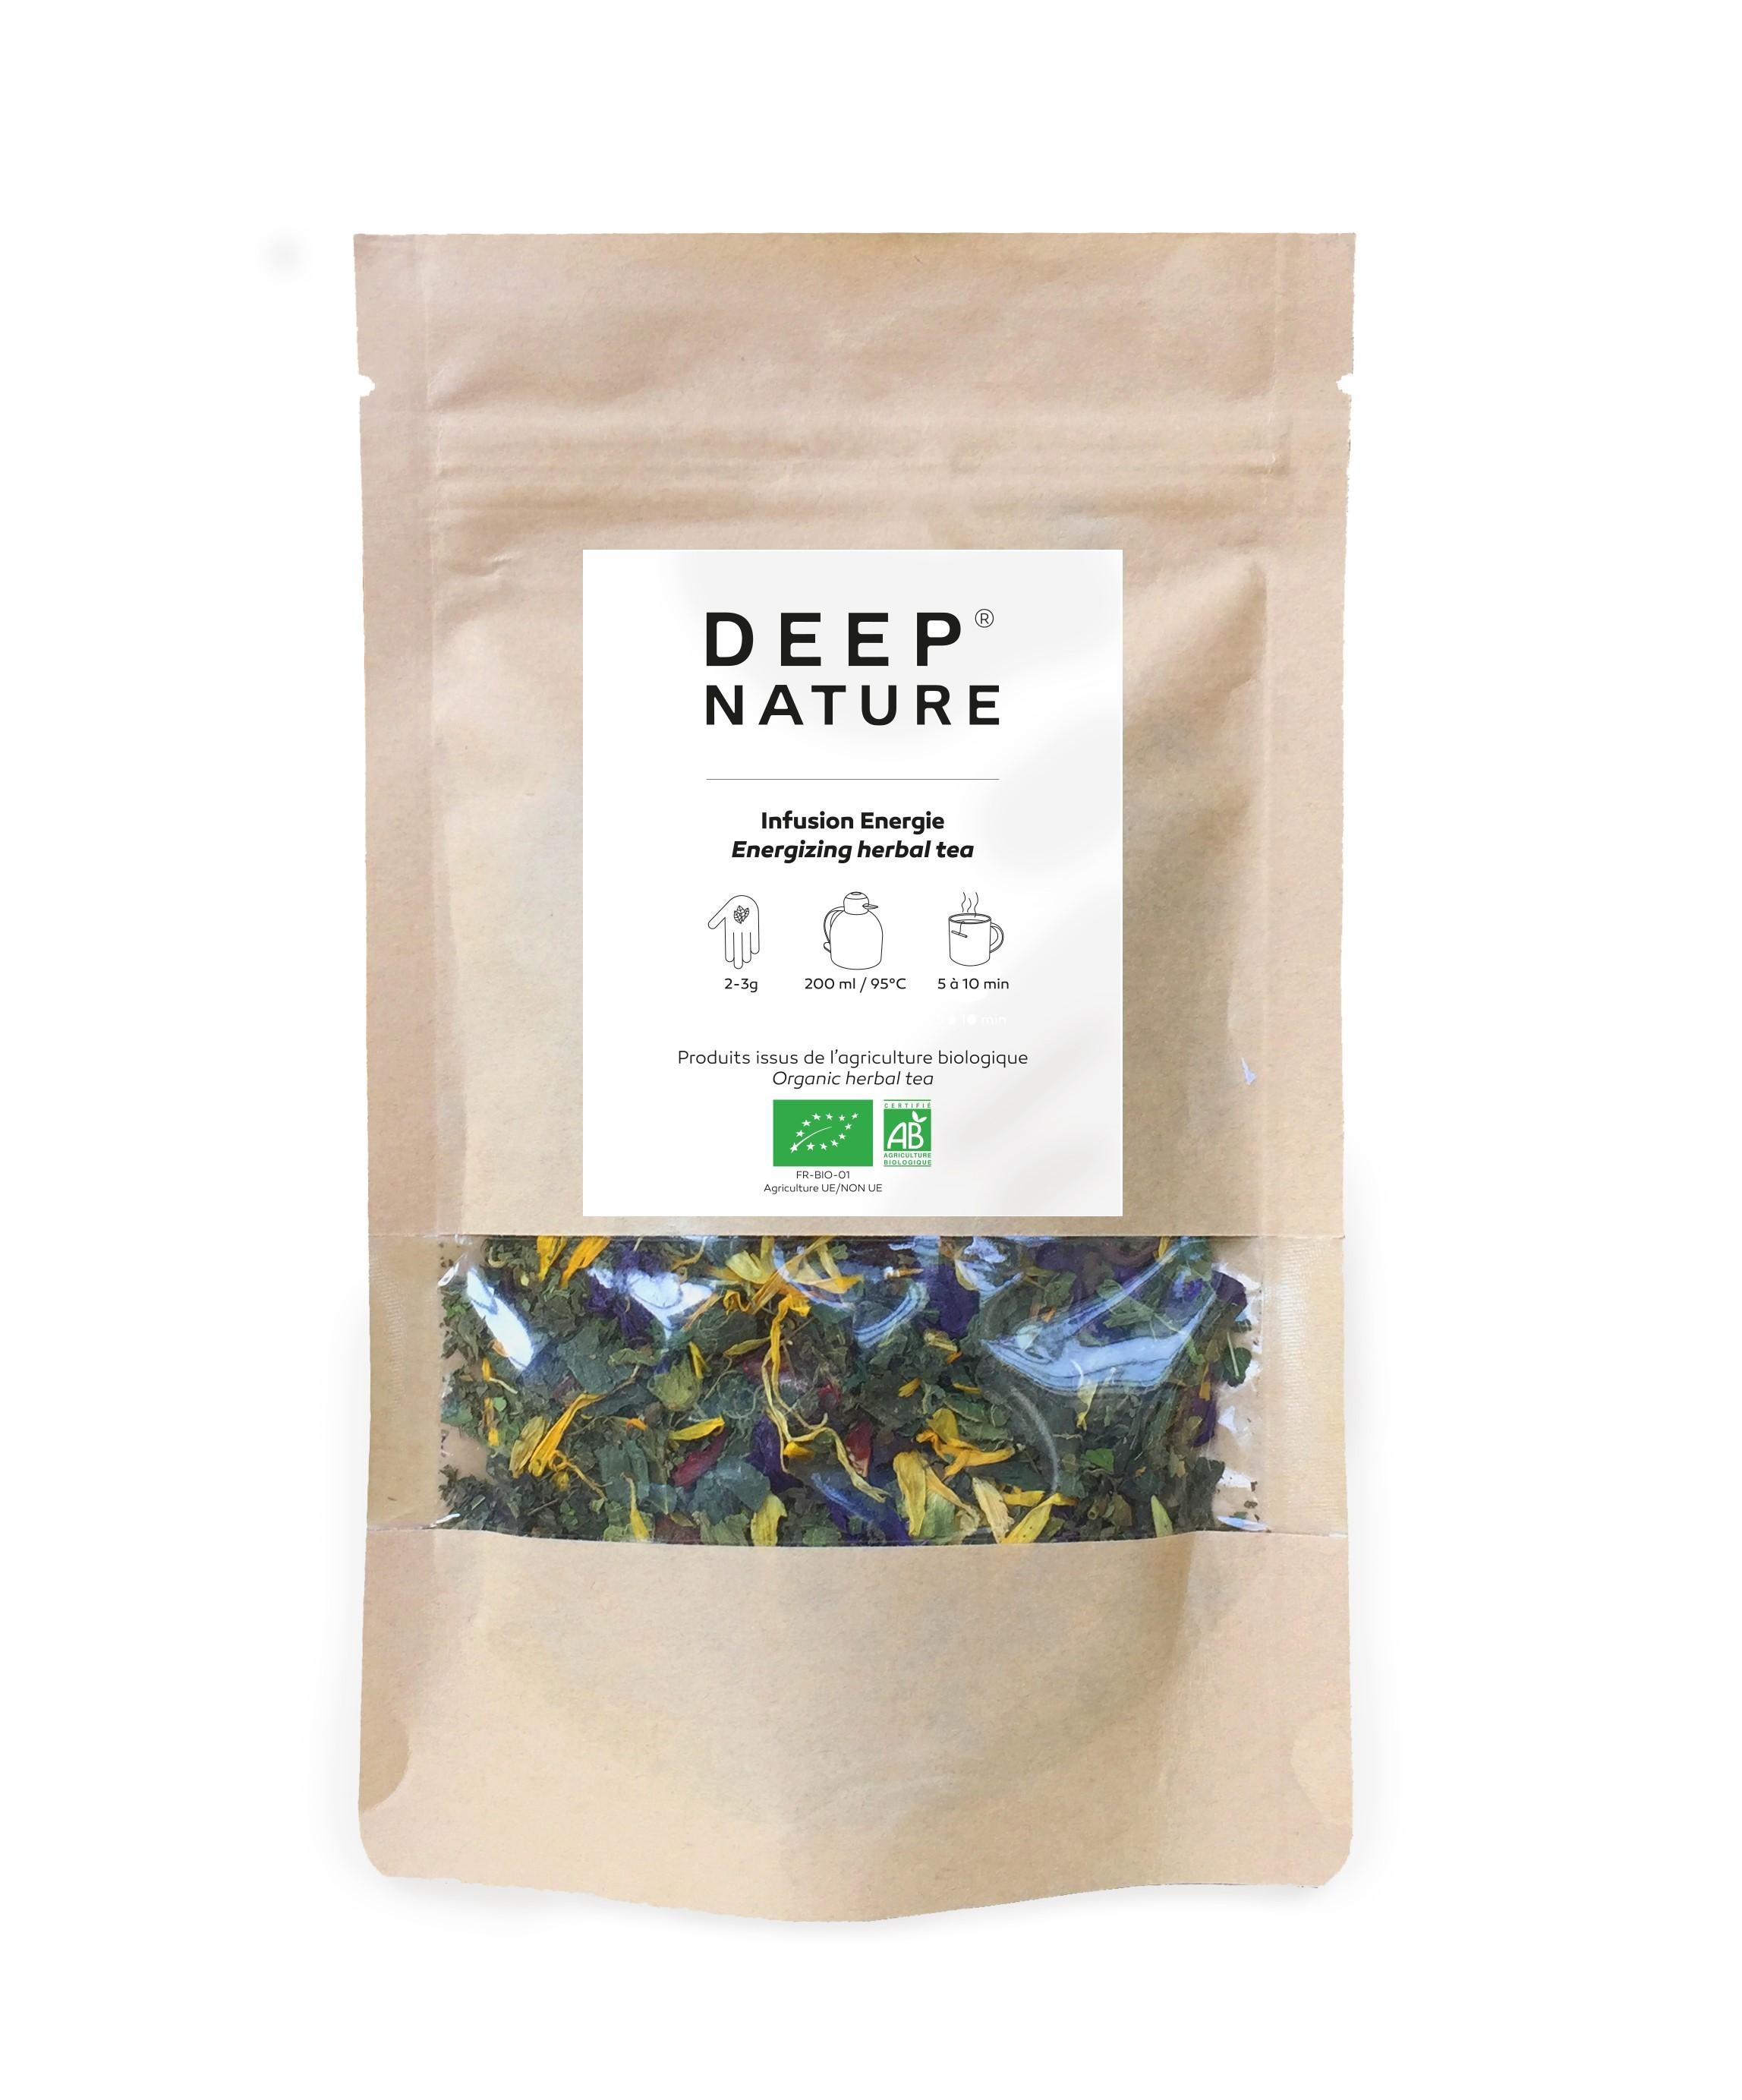 Deep Nature Energising herbal tea